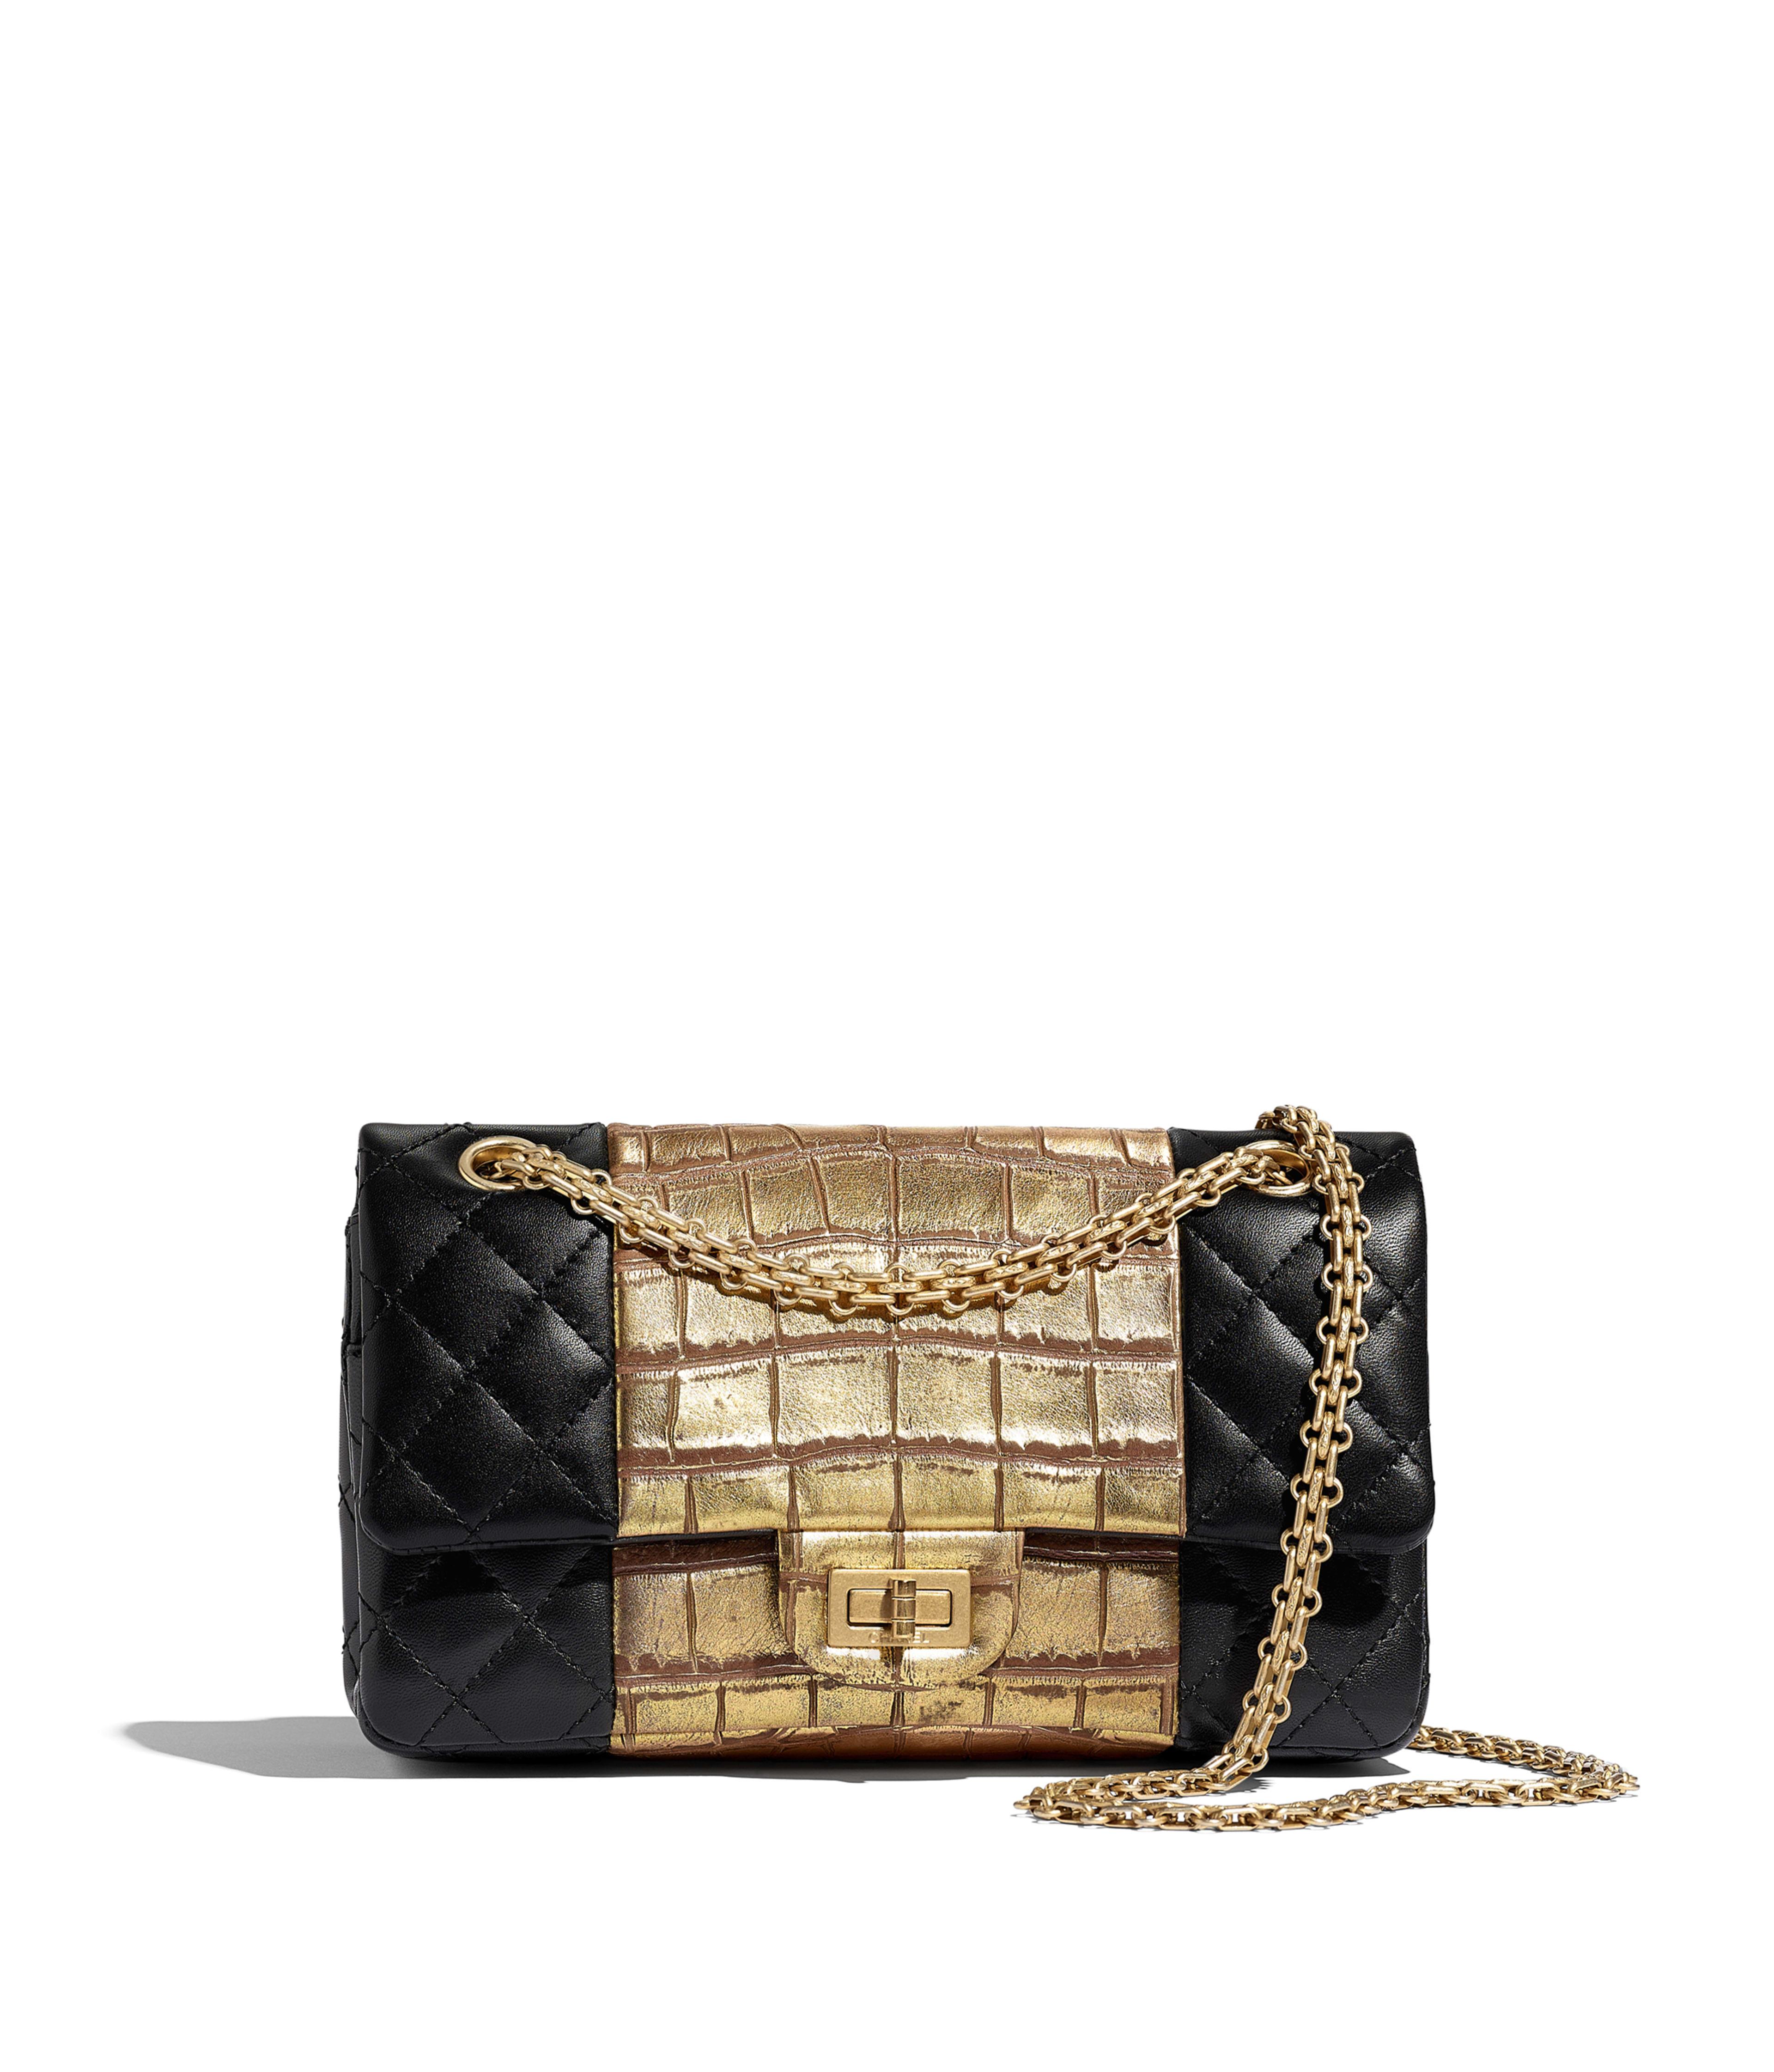 29c2671272499b 2.55 Handbag Lambskin, Crocodile Embossed Calfskin & Gold-Tone Metal, Black  & Gold Ref. A37586B00922N0784